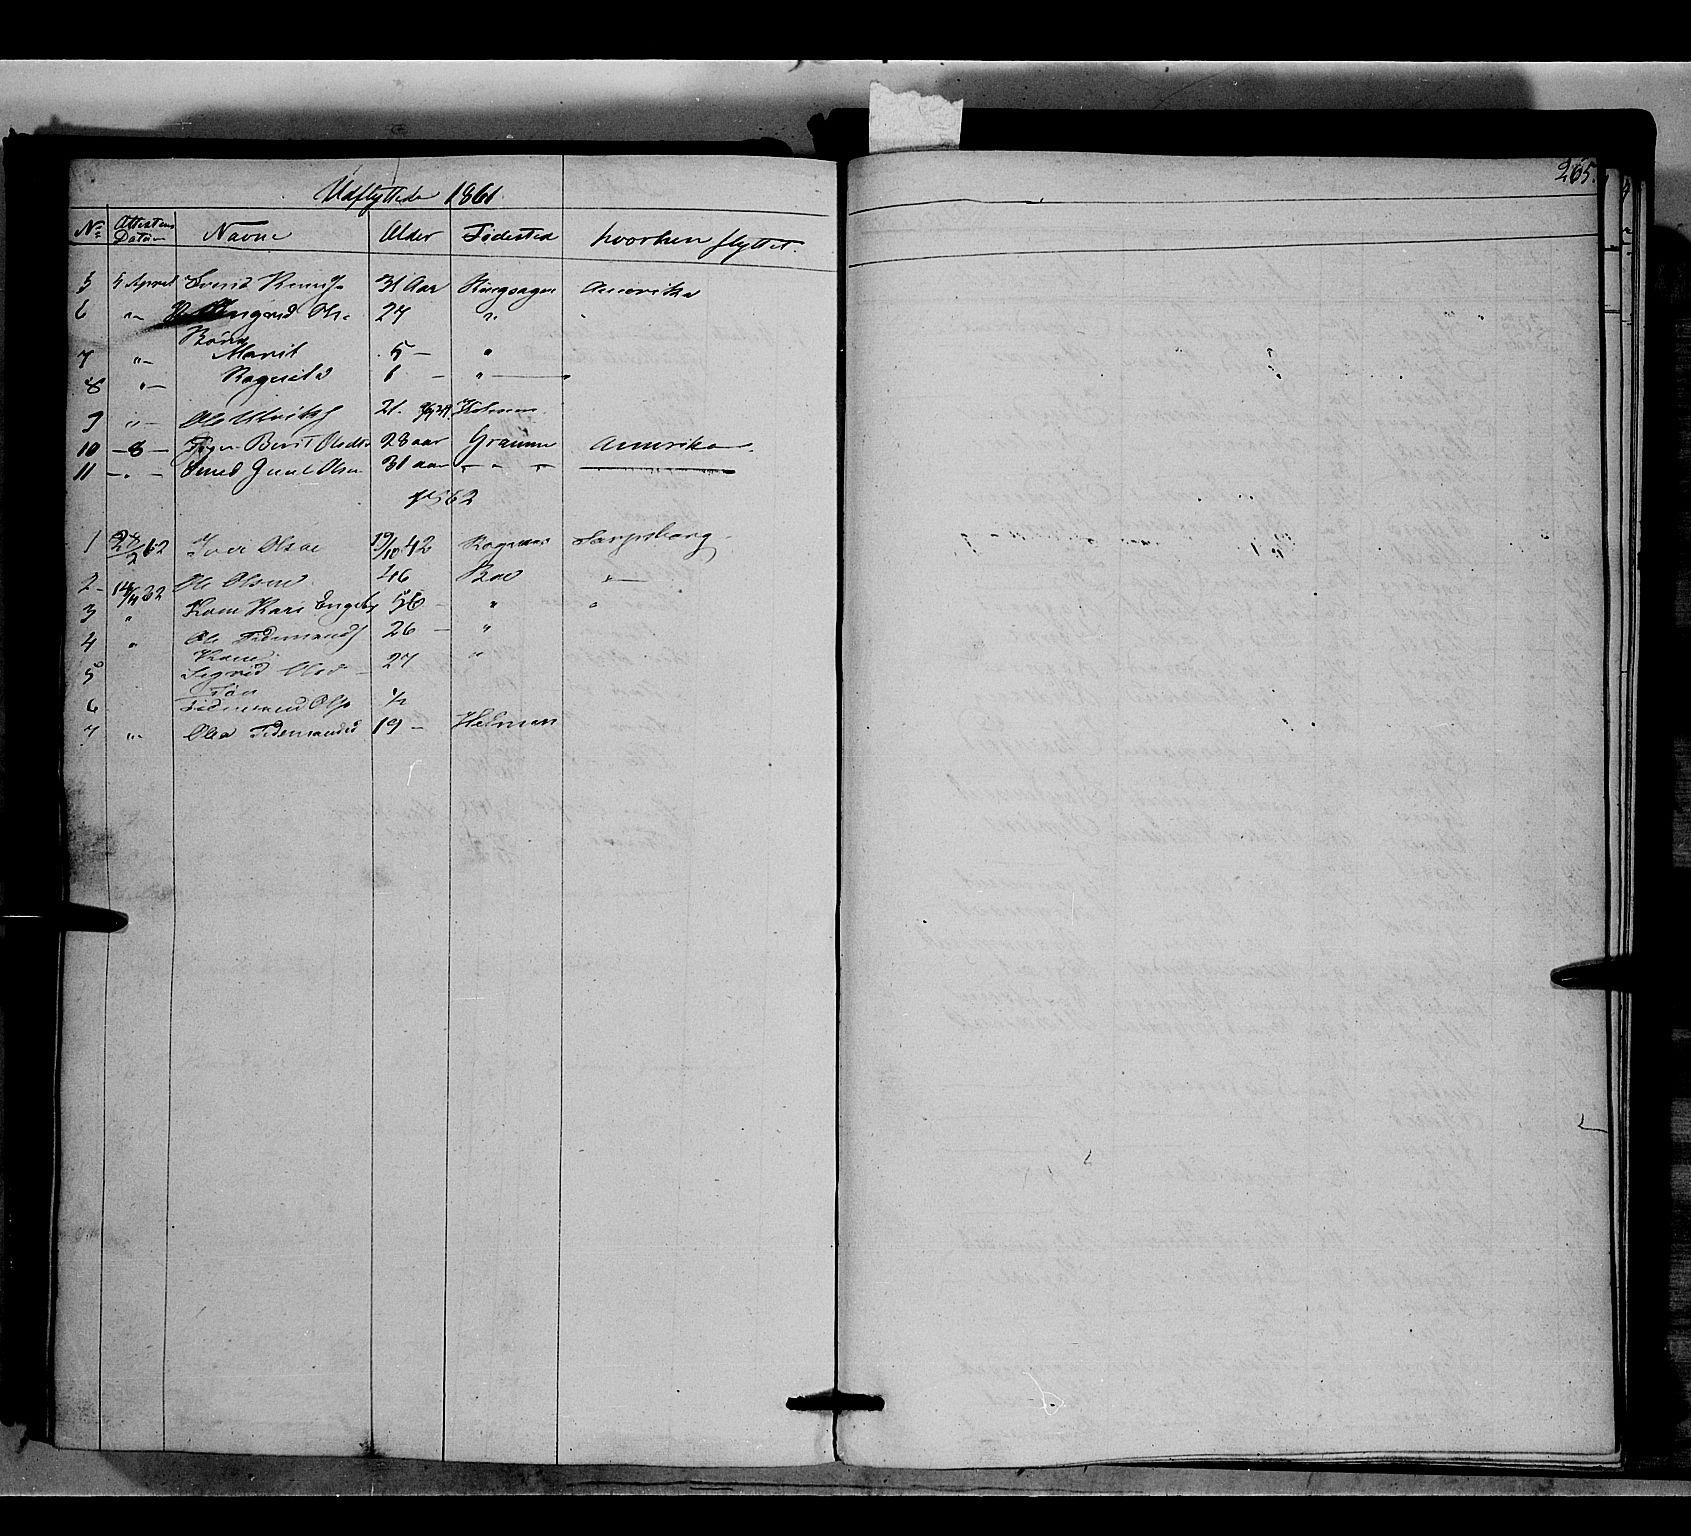 SAH, Nord-Aurdal prestekontor, Ministerialbok nr. 6, 1842-1863, s. 265